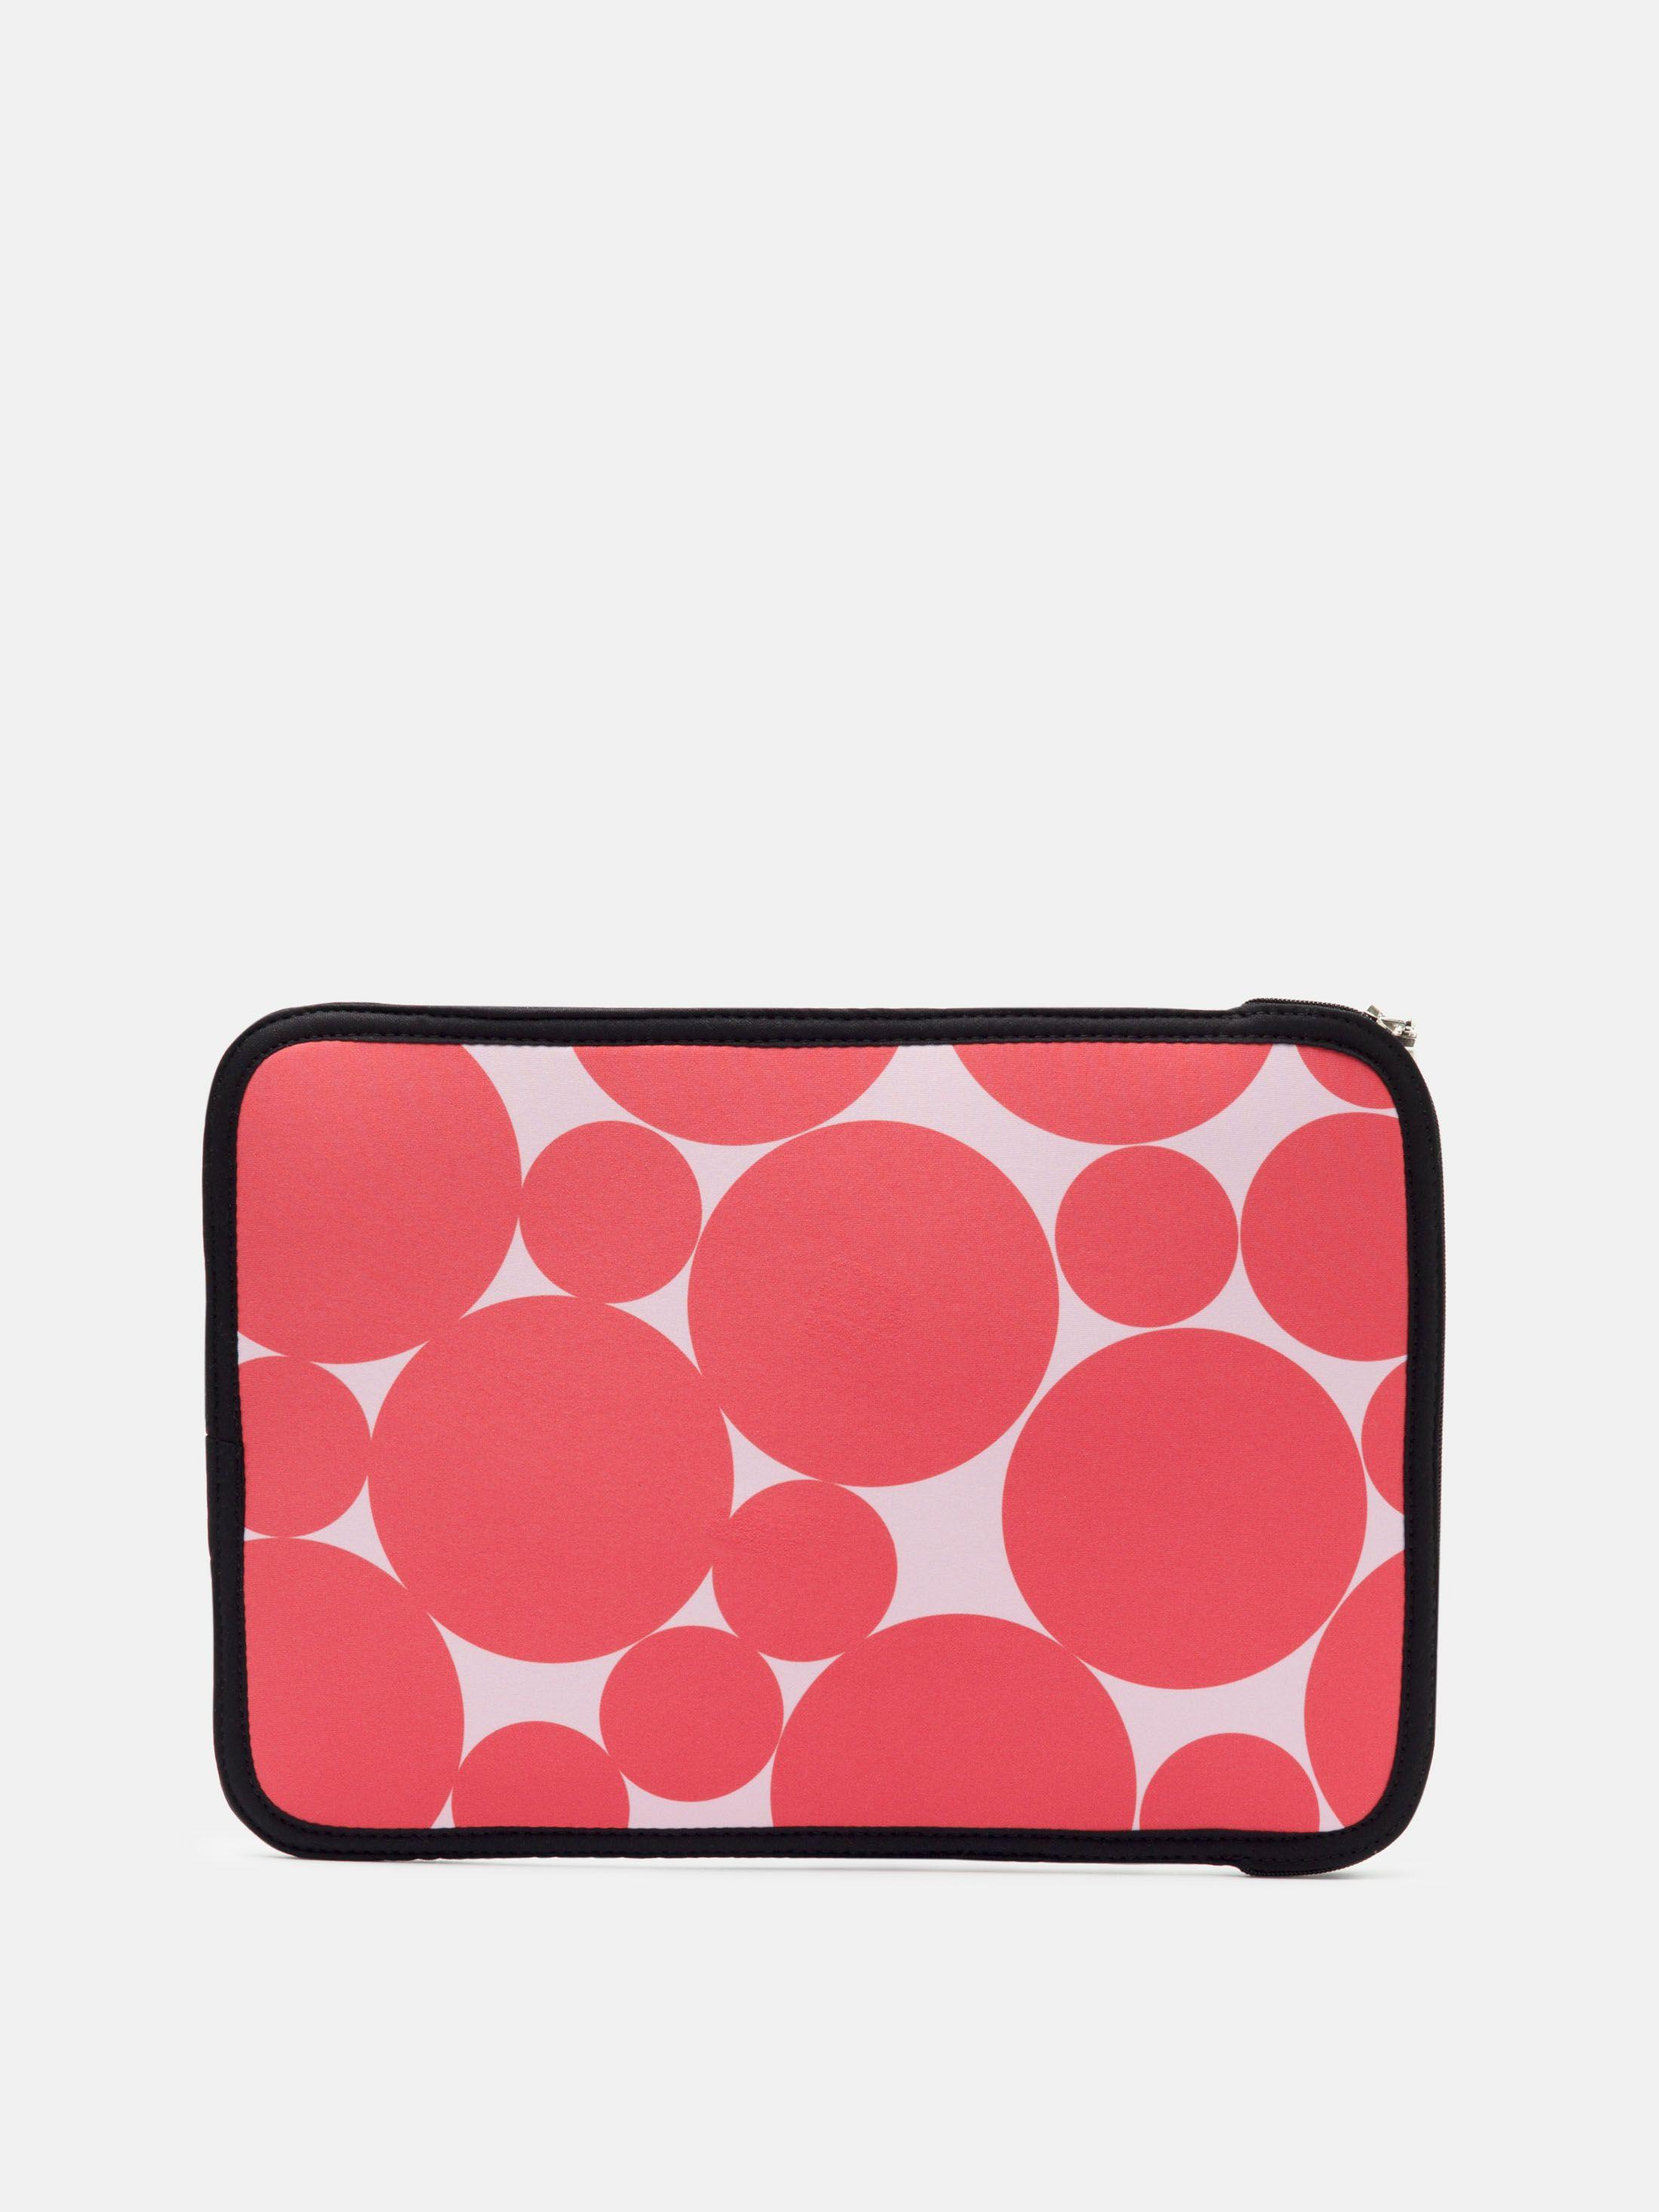 Design Your Own MacBook Air Case